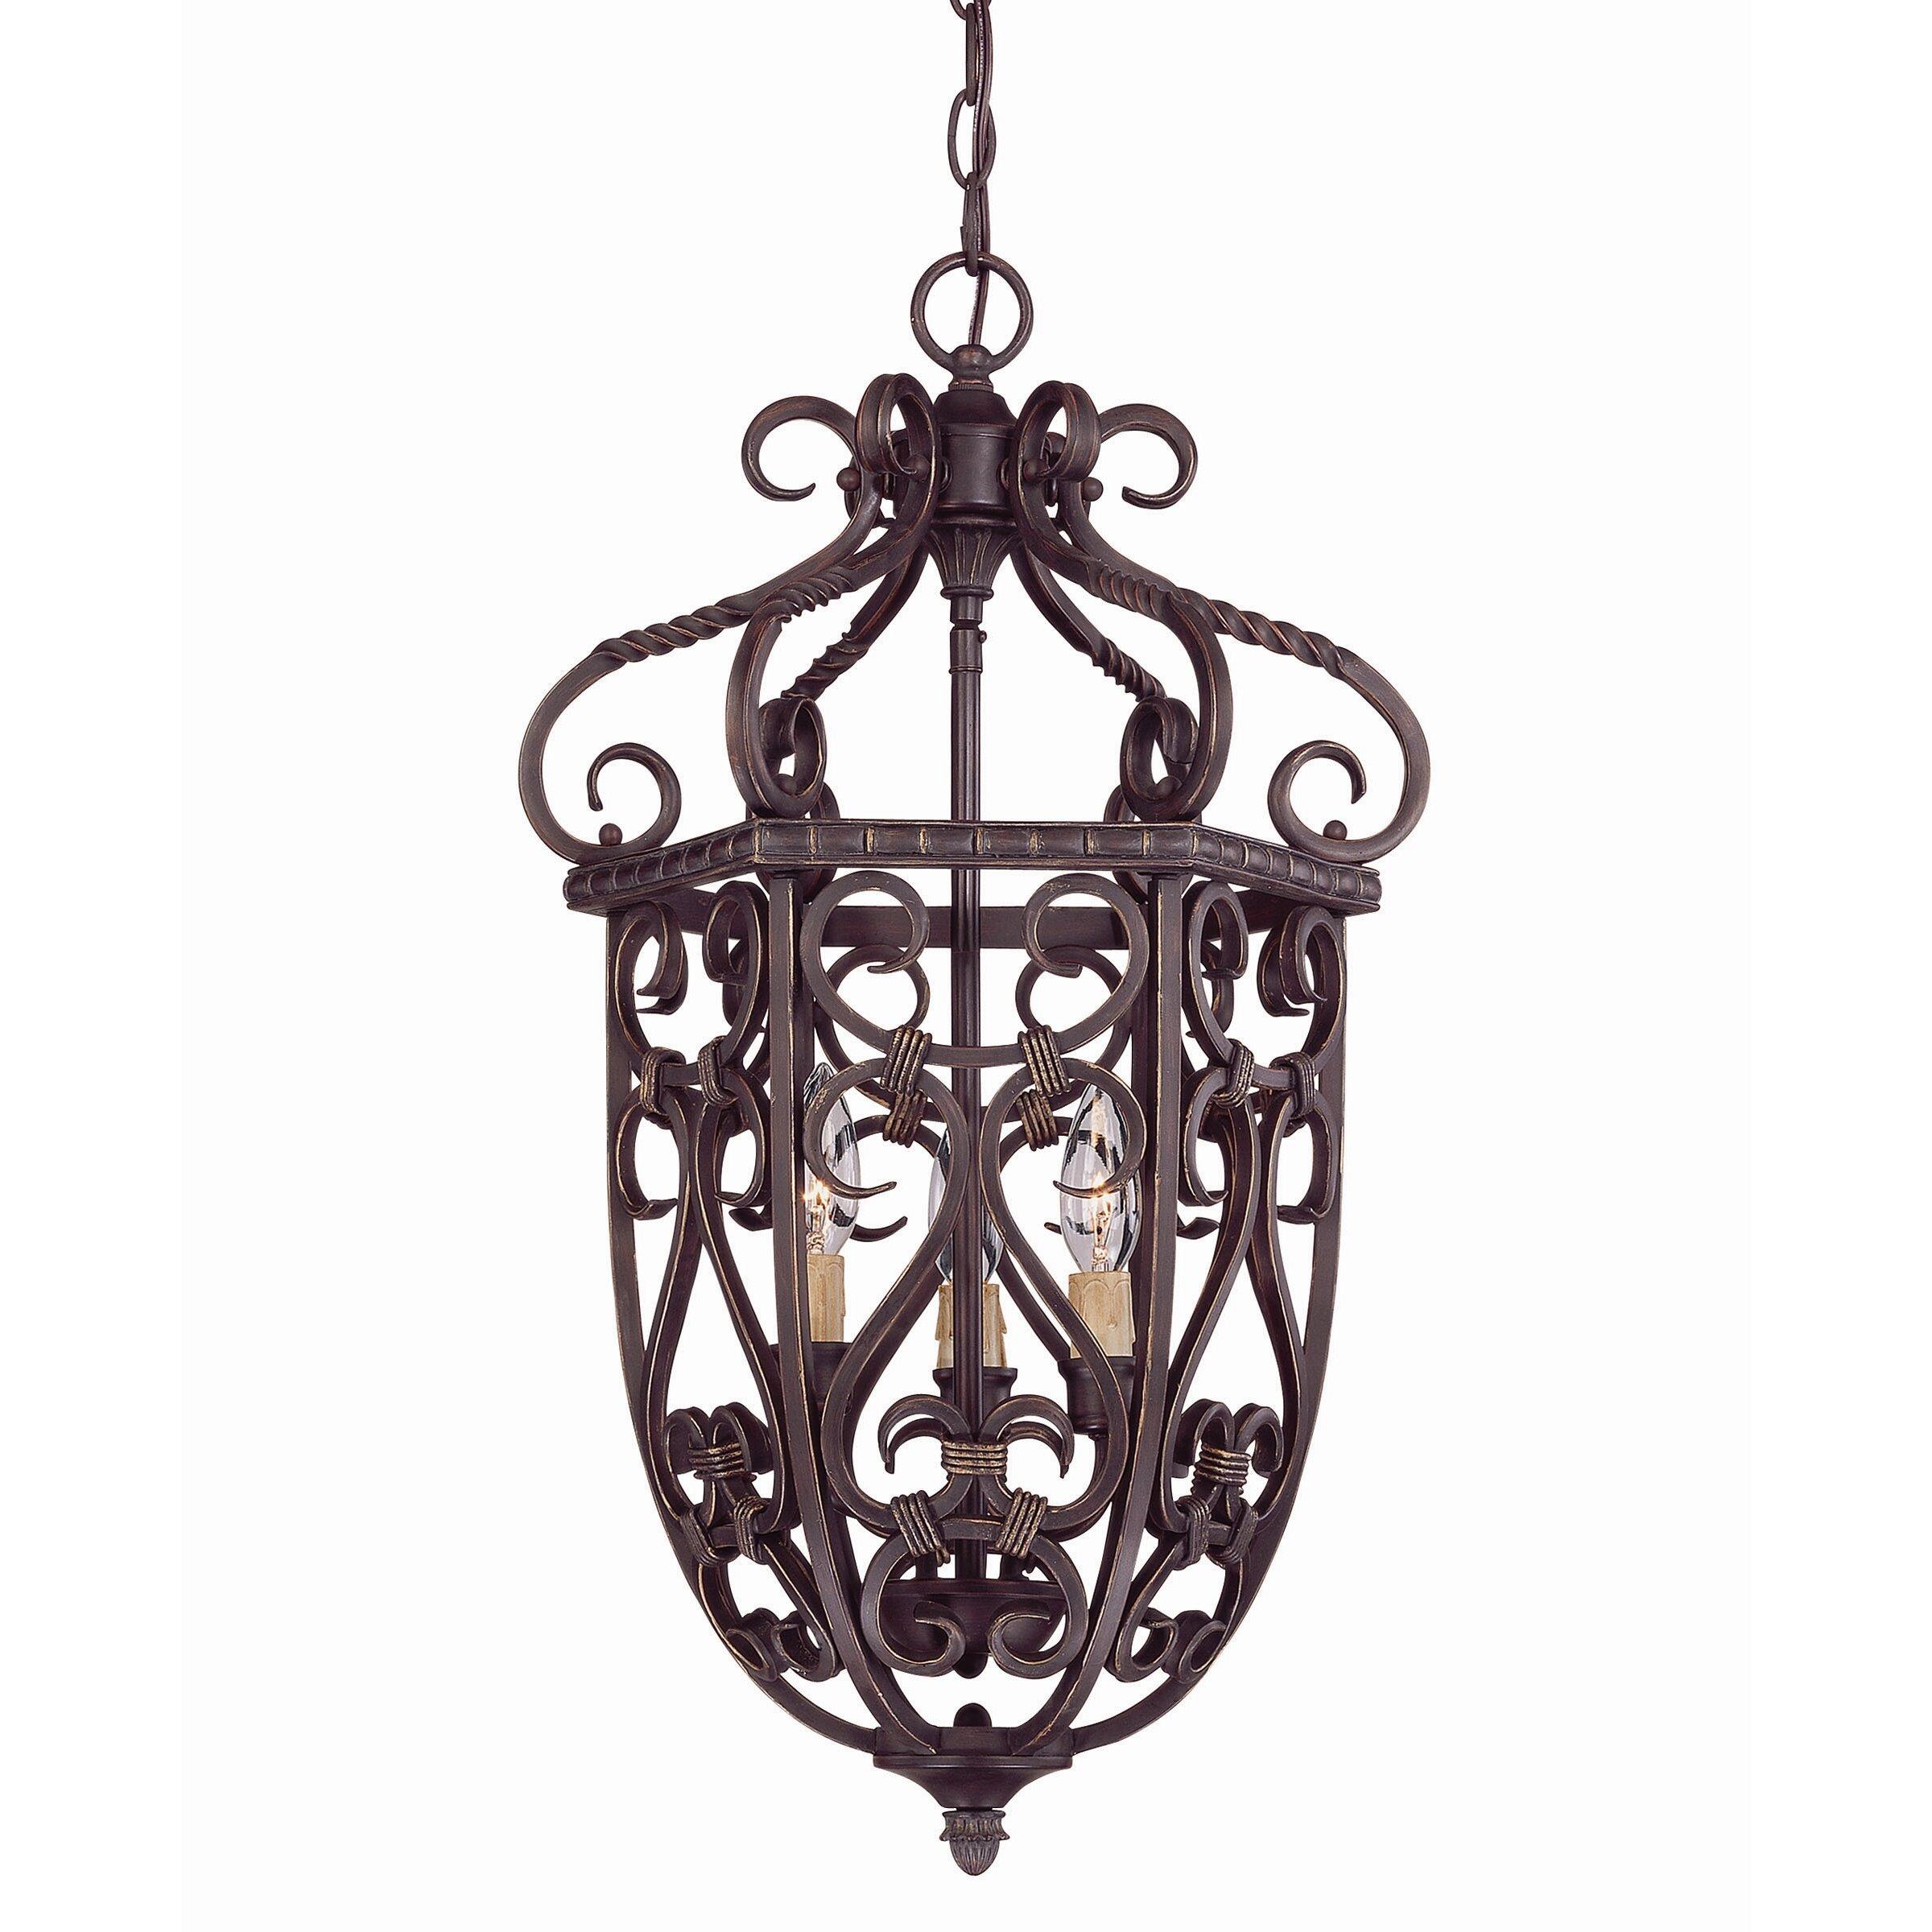 Savoy House Foyer Pendant : Savoy house bellingham light cage foyer pendant